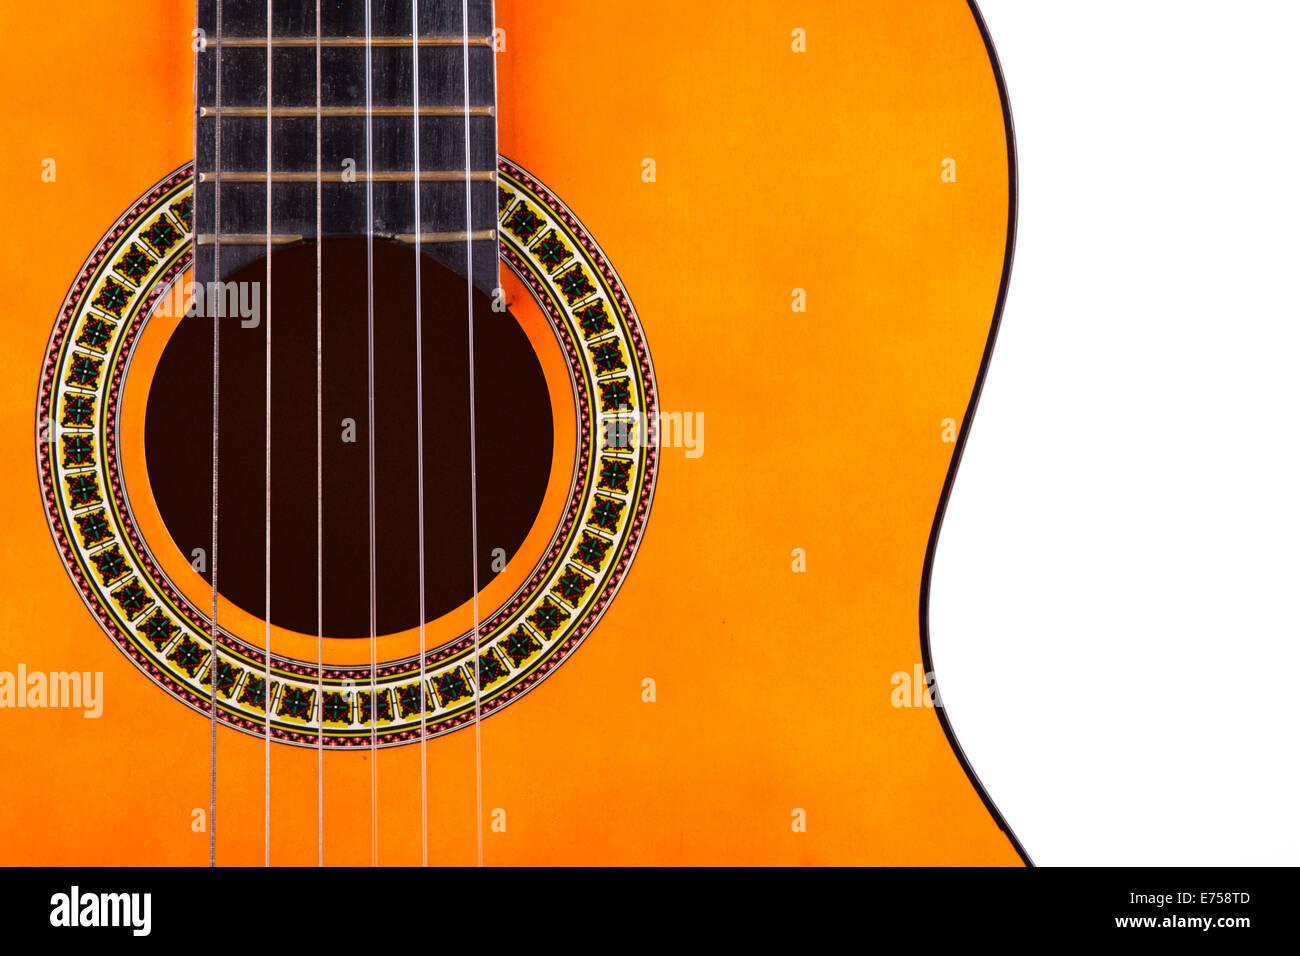 Vista frontal de la guitarra acústica, clásica de madera aislado sobre fondo blanco. Foto de stock